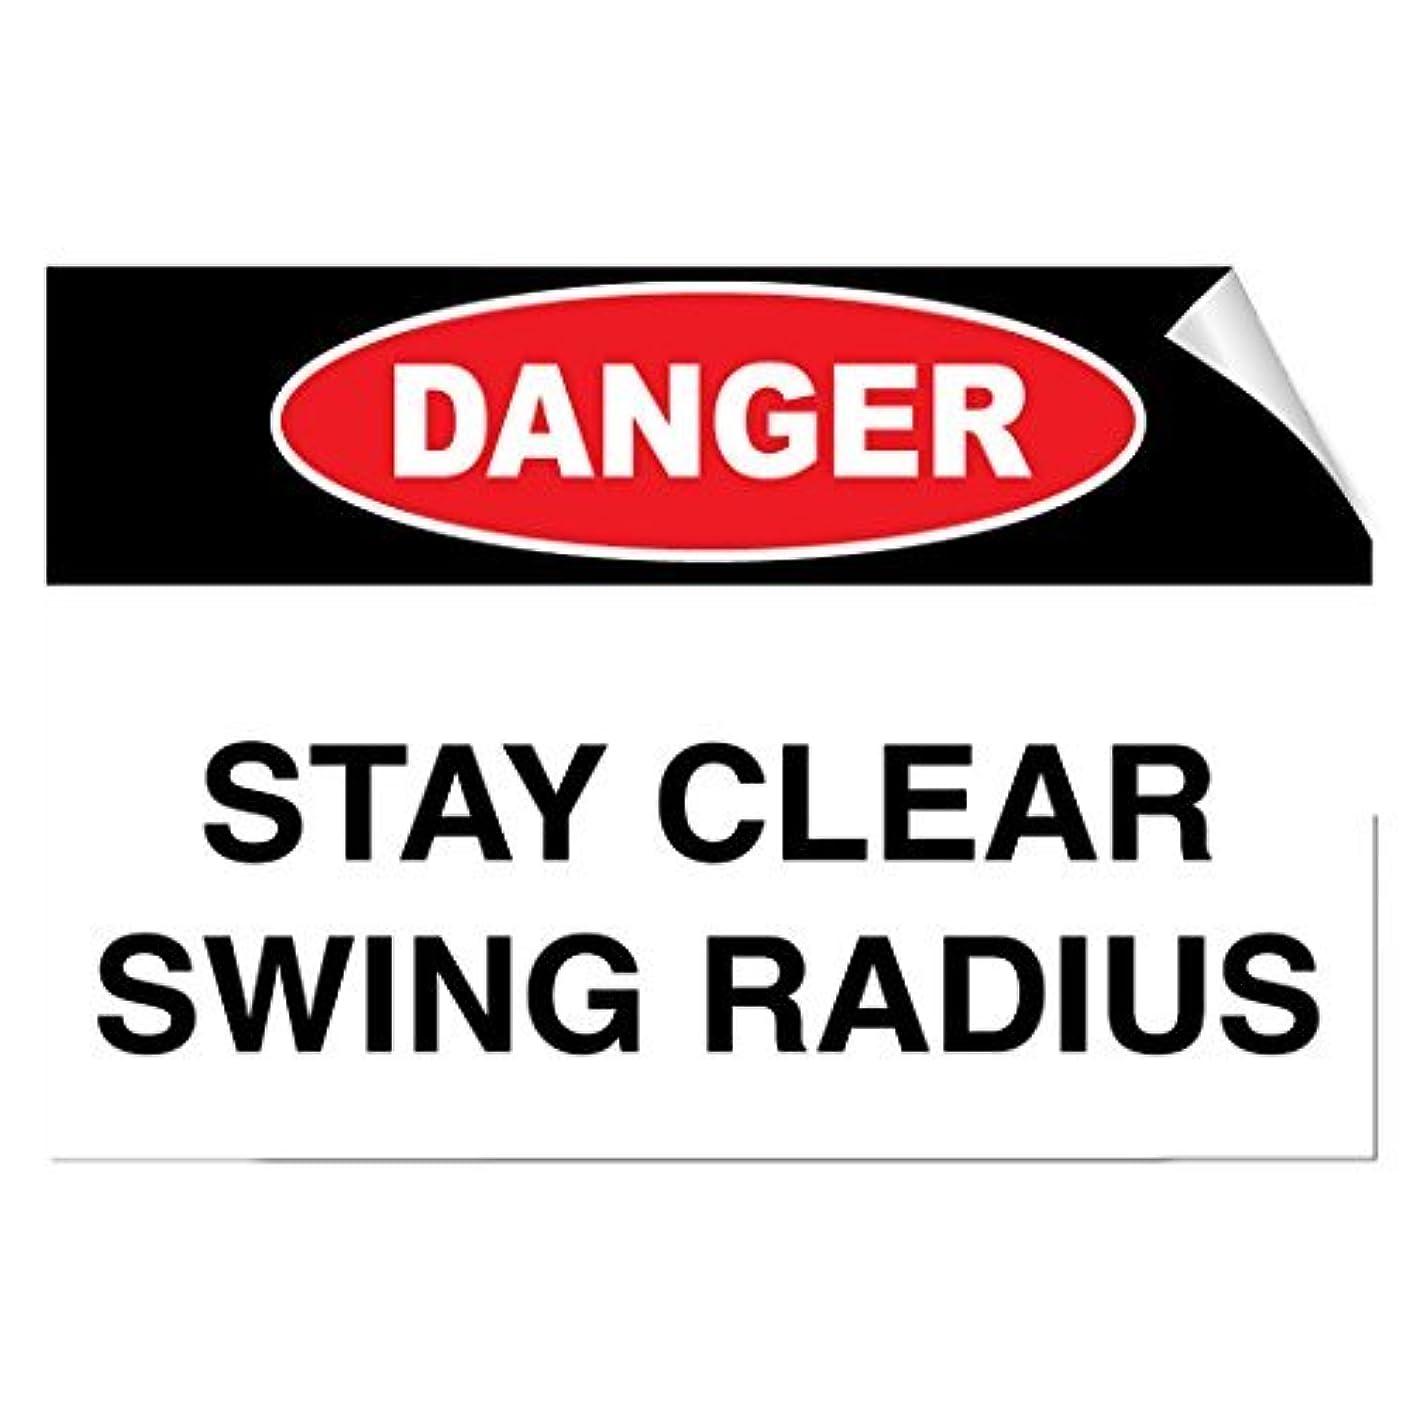 Danger 1 Stay Clear Swing Radius Hazard Vinyl Decal Sticker 10x7 inches